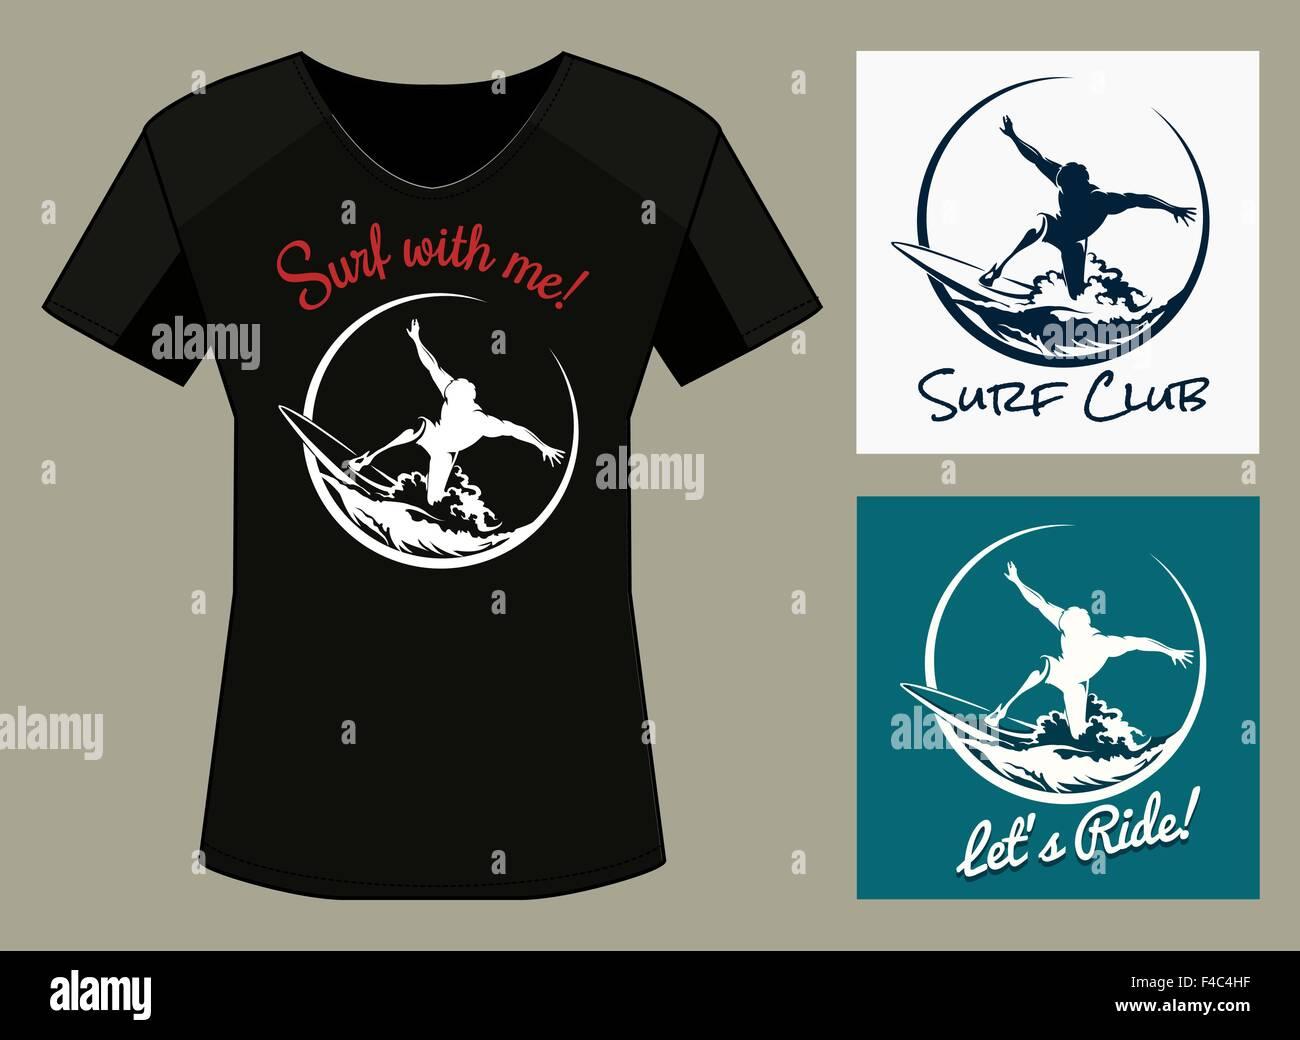 T Shirt Print In Three Color Variations Surfer Club Print Design